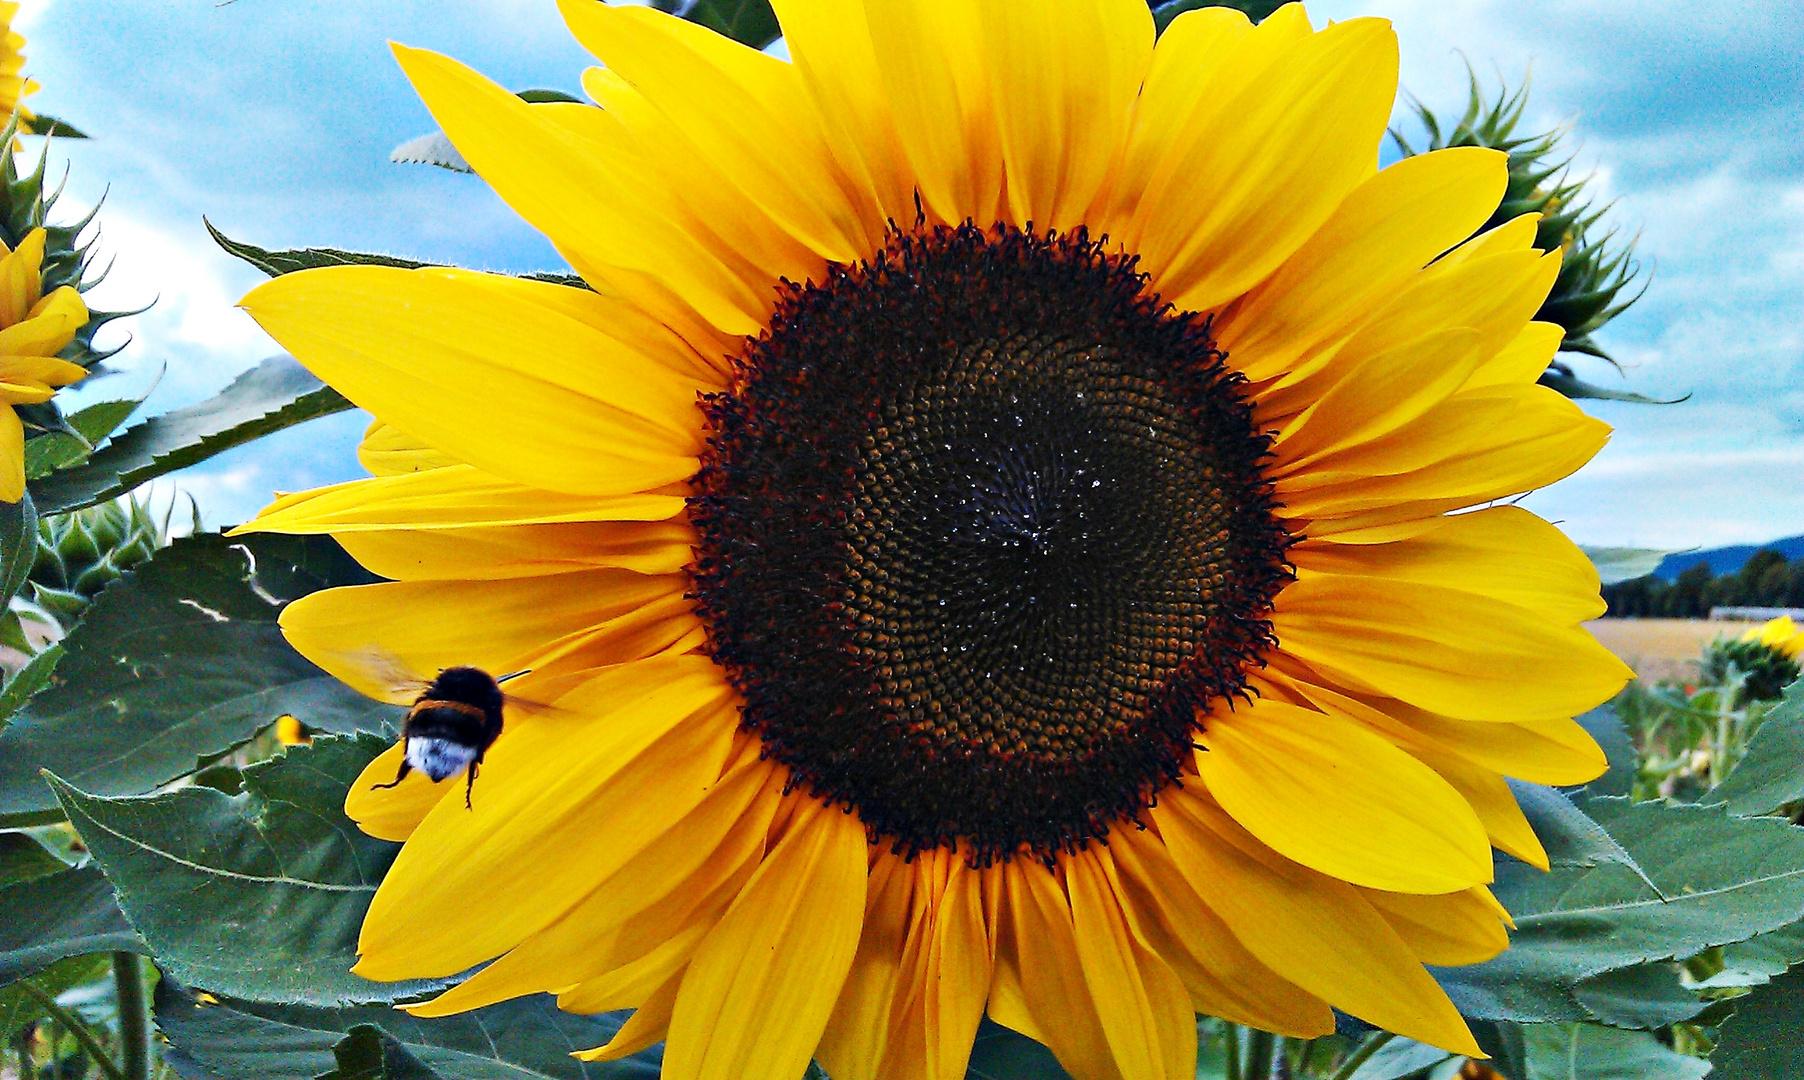 hummel im anflug auf die sonnenblume foto bild pflanzen pilze flechten bl ten. Black Bedroom Furniture Sets. Home Design Ideas